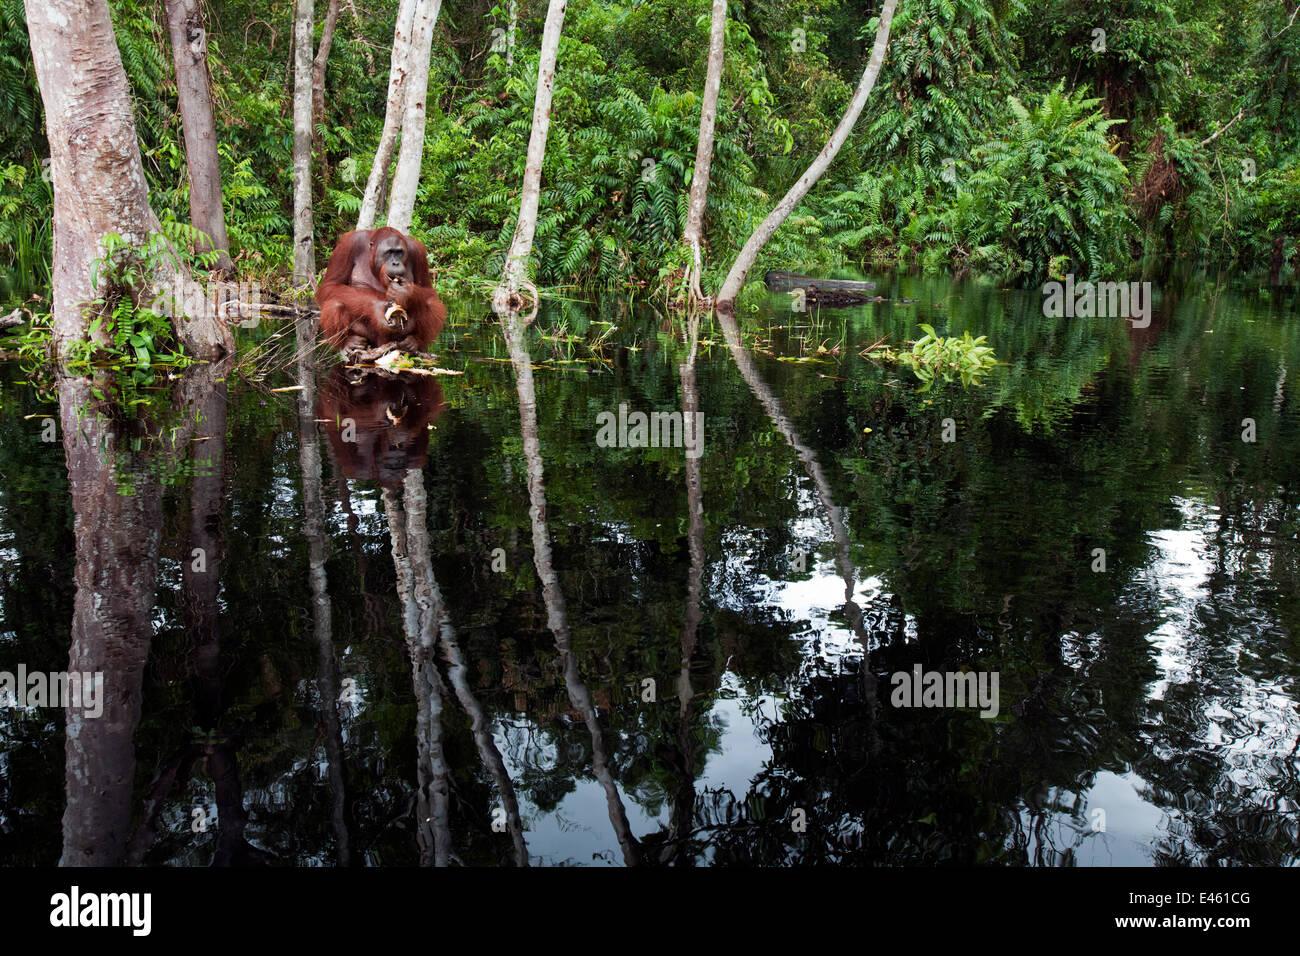 Bornean Orangutan (Pongo pygmaeus wurmbii) sub-adult male 'Oman' sitting on a clump of vegetation in the - Stock Image